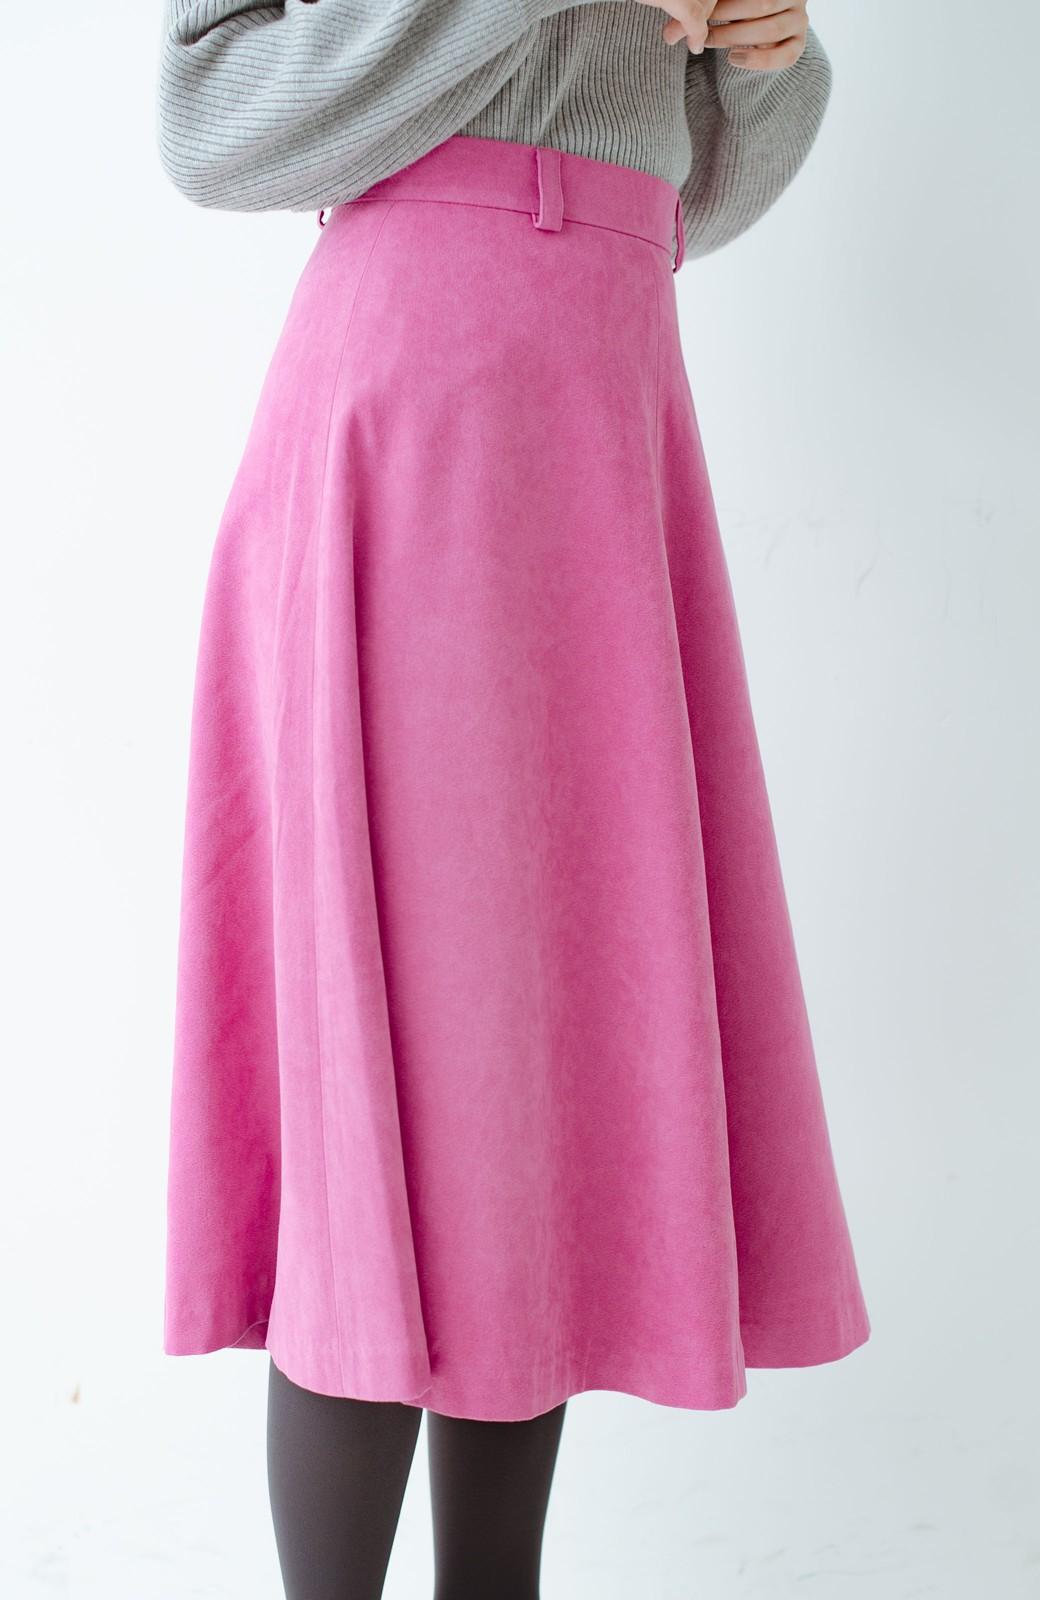 haco! 女っぽく上品に見える フレアースカート by que made me <ピンク>の商品写真5